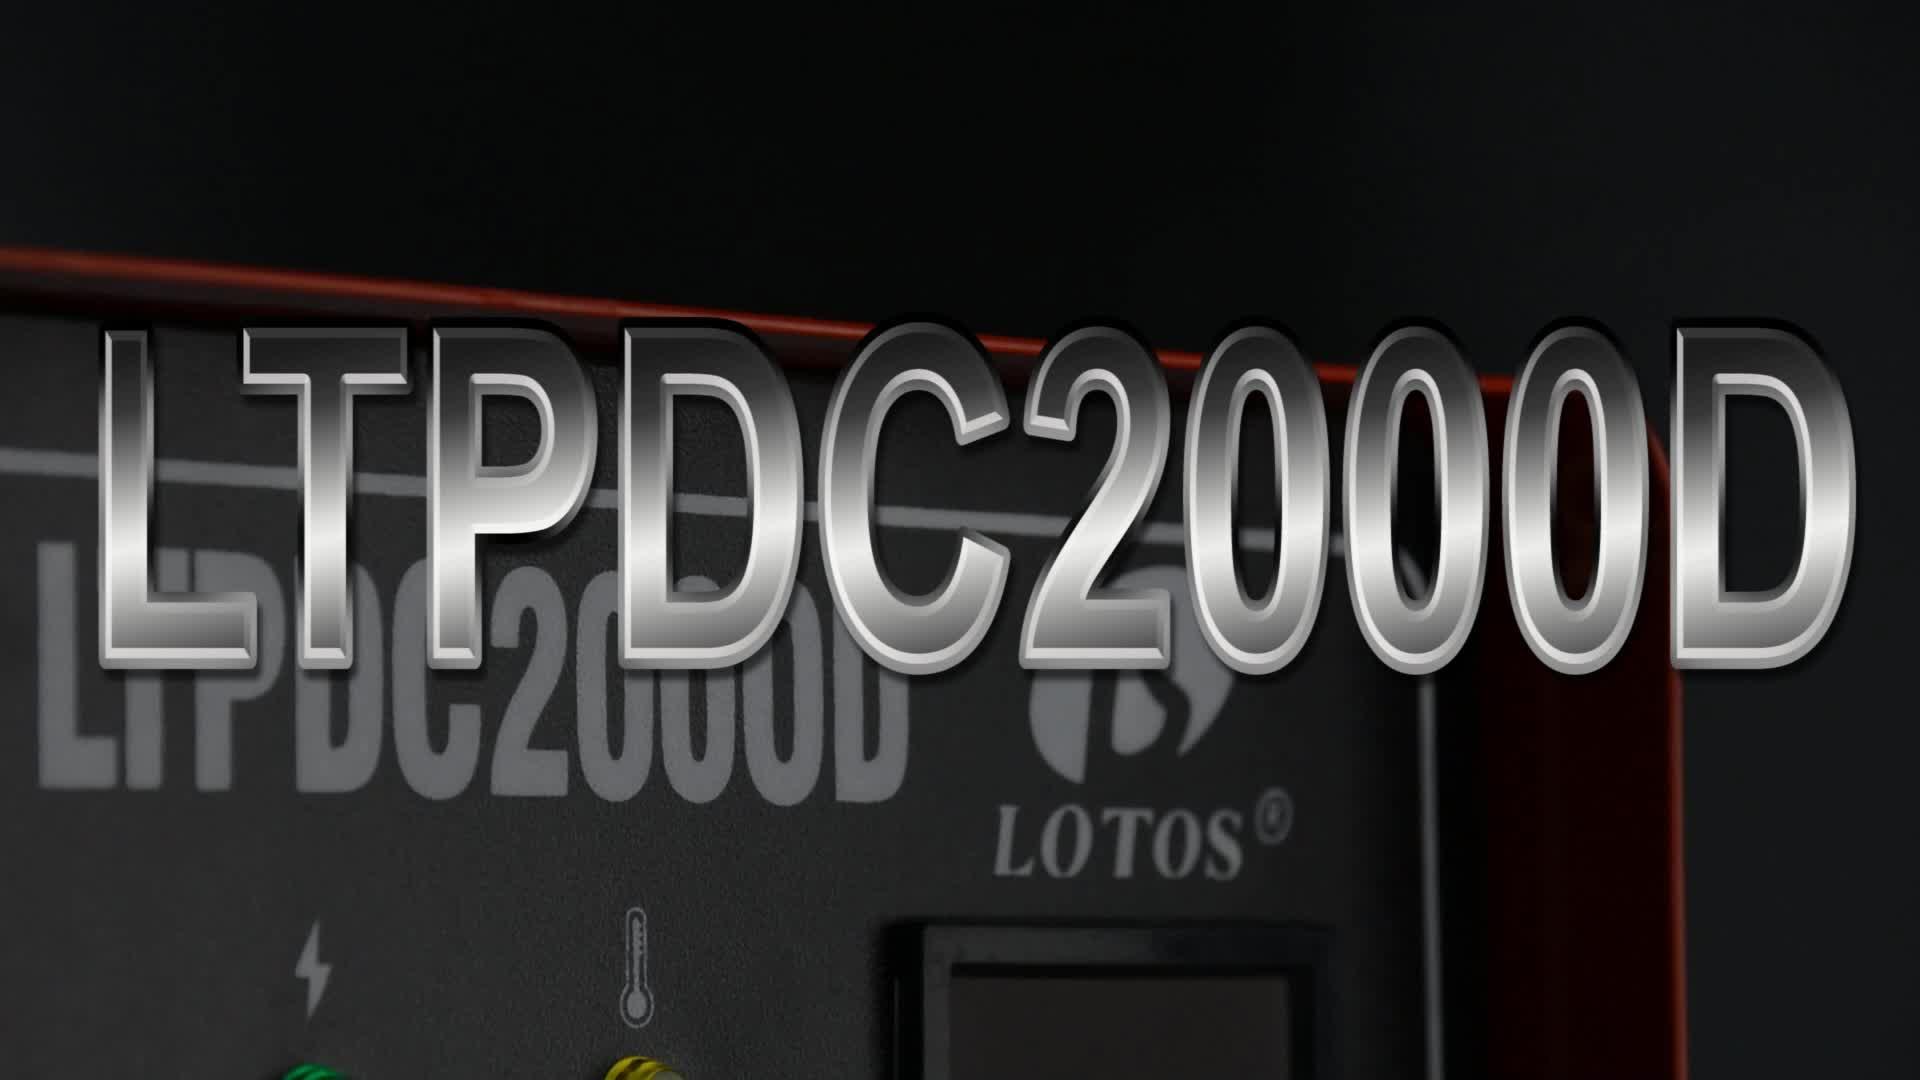 Lotos Ltpdc2000d 3 In 1 110 220v Gasless Mig Welder Inverter Flux Wiring Diagram Cored Wire